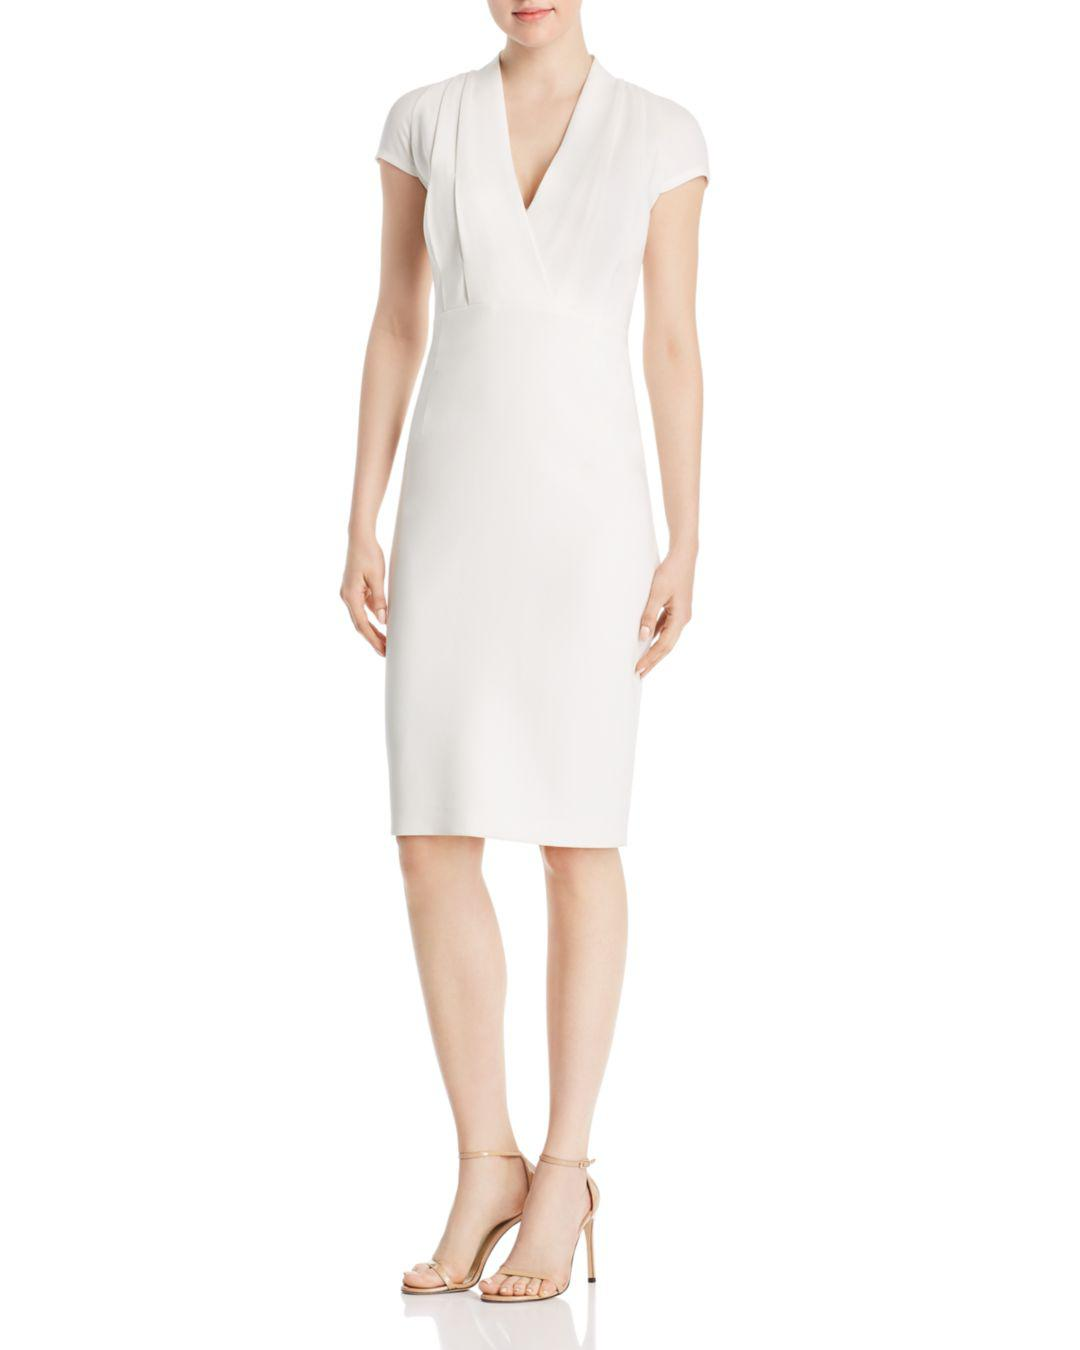 6e28fb47 Lyst - Elie Tahari Gerarda V-neck Sheath Dress in White